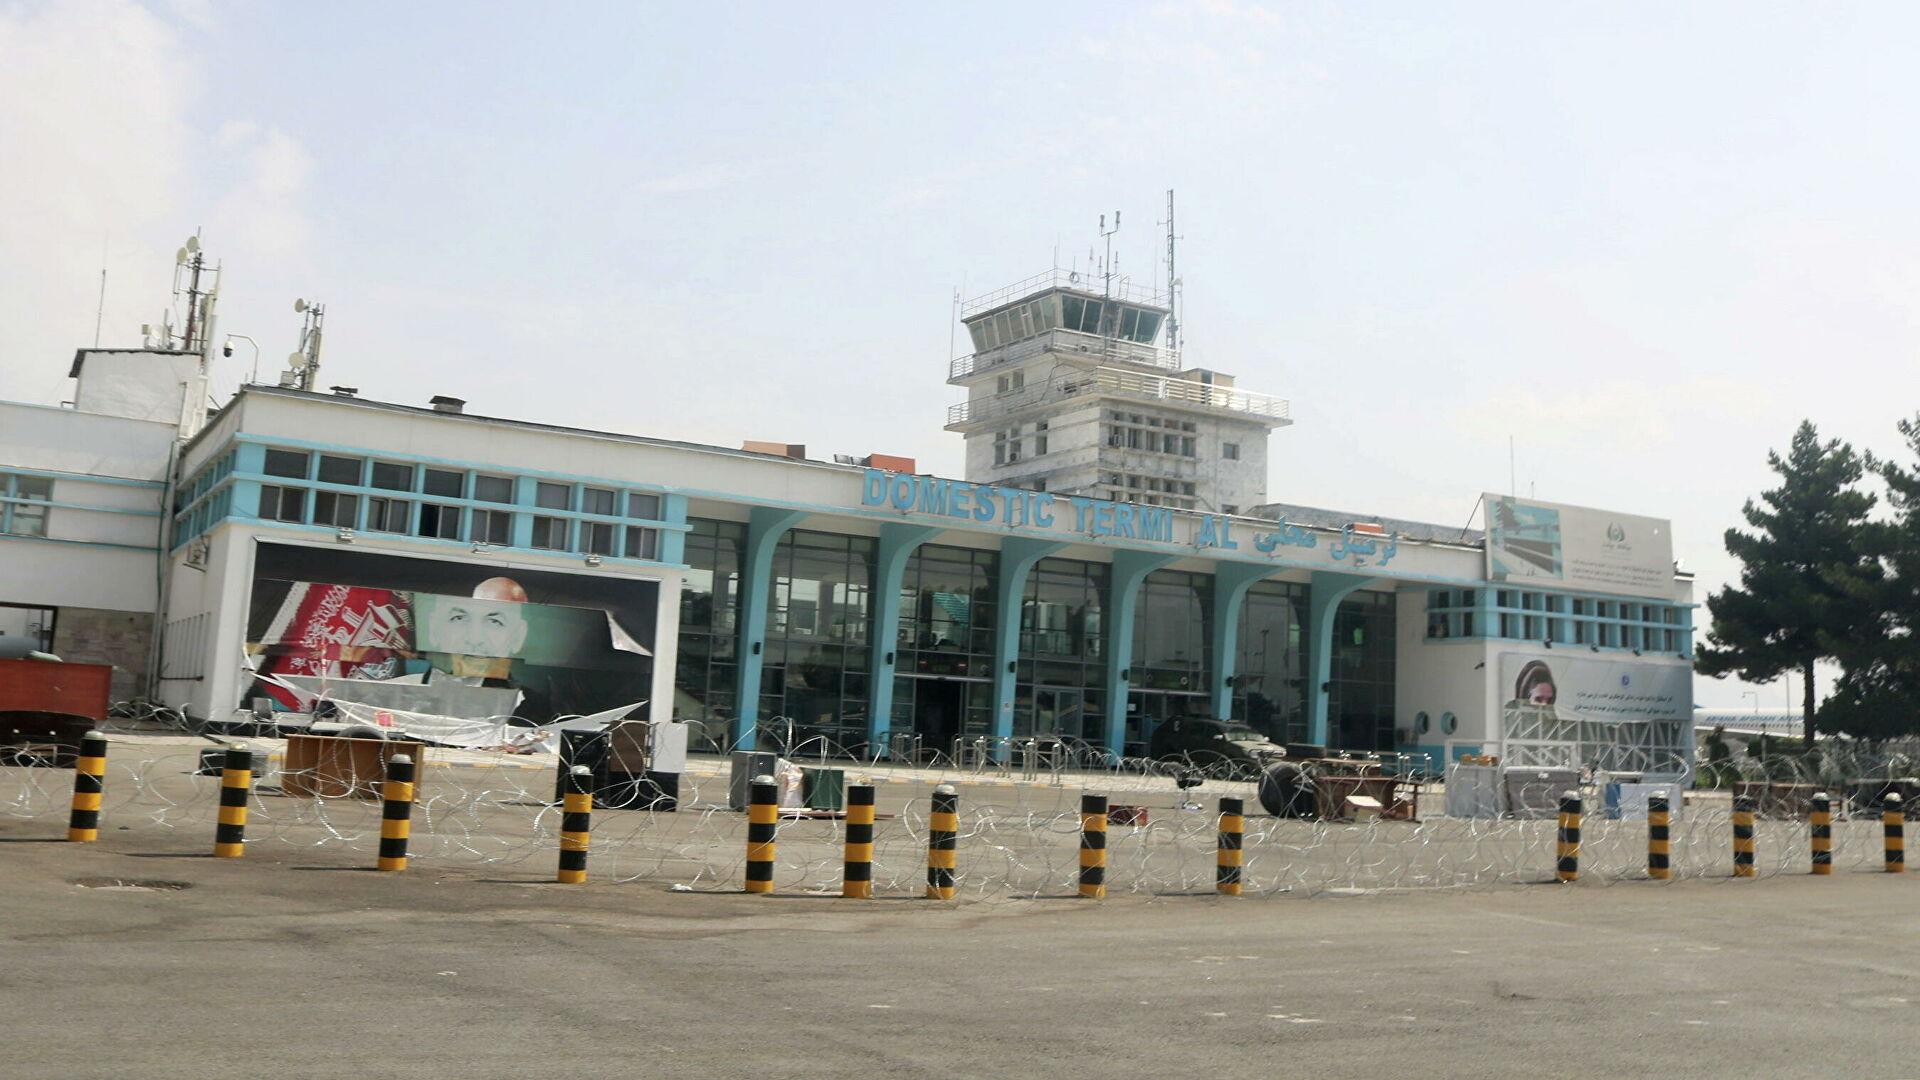 Спецназ «Талибана» со знаменосцем зачистил аэропорт Кабула